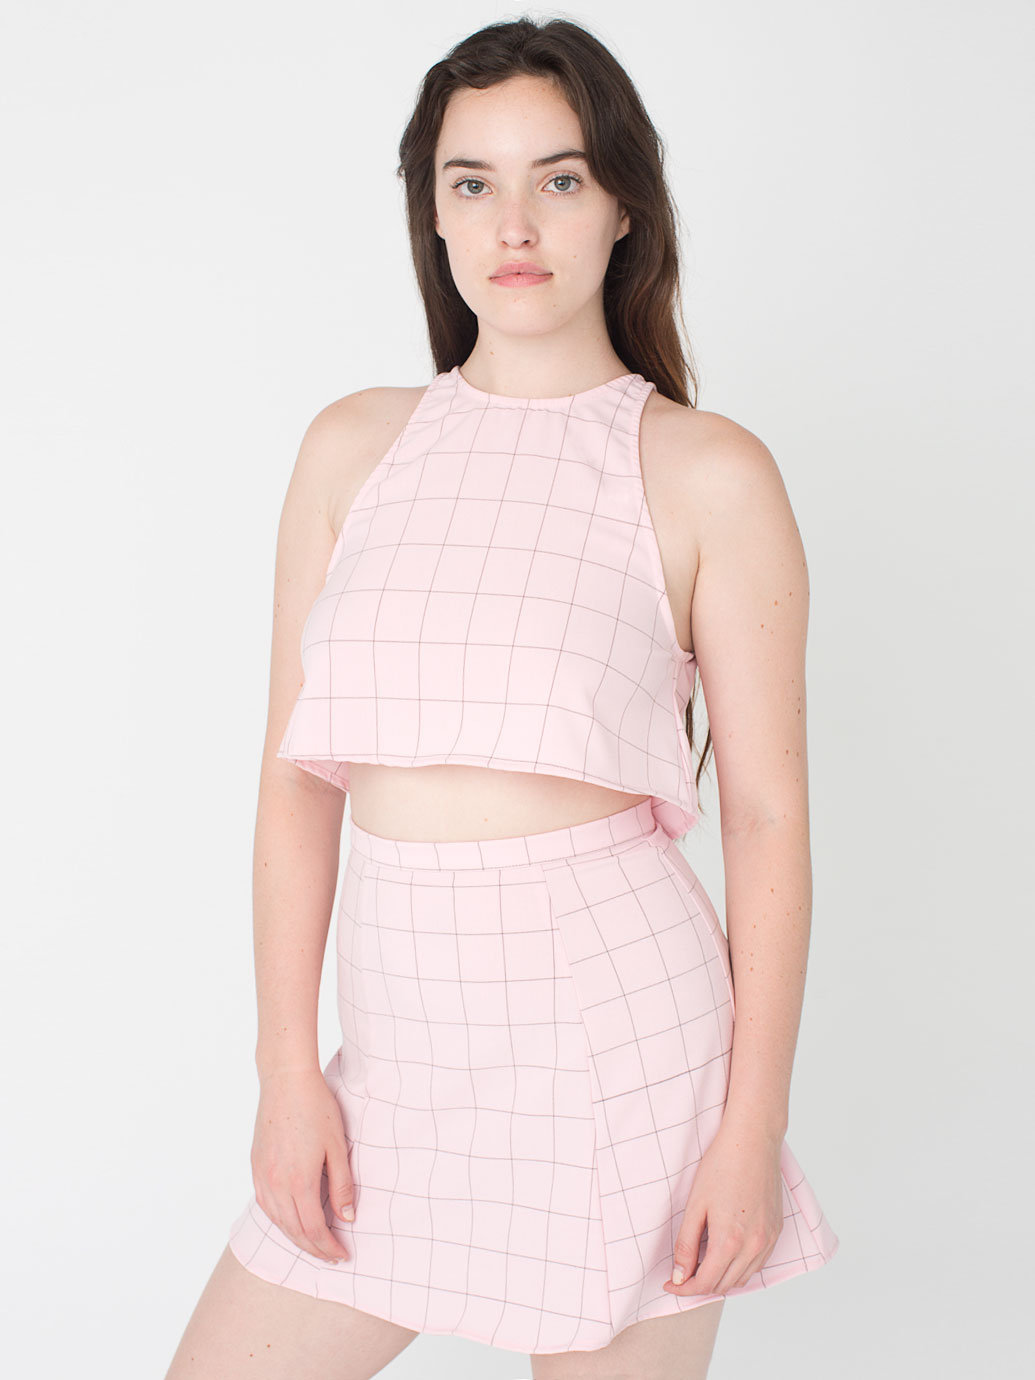 The Grid Print Lolita Mini Skirt | American Apparel